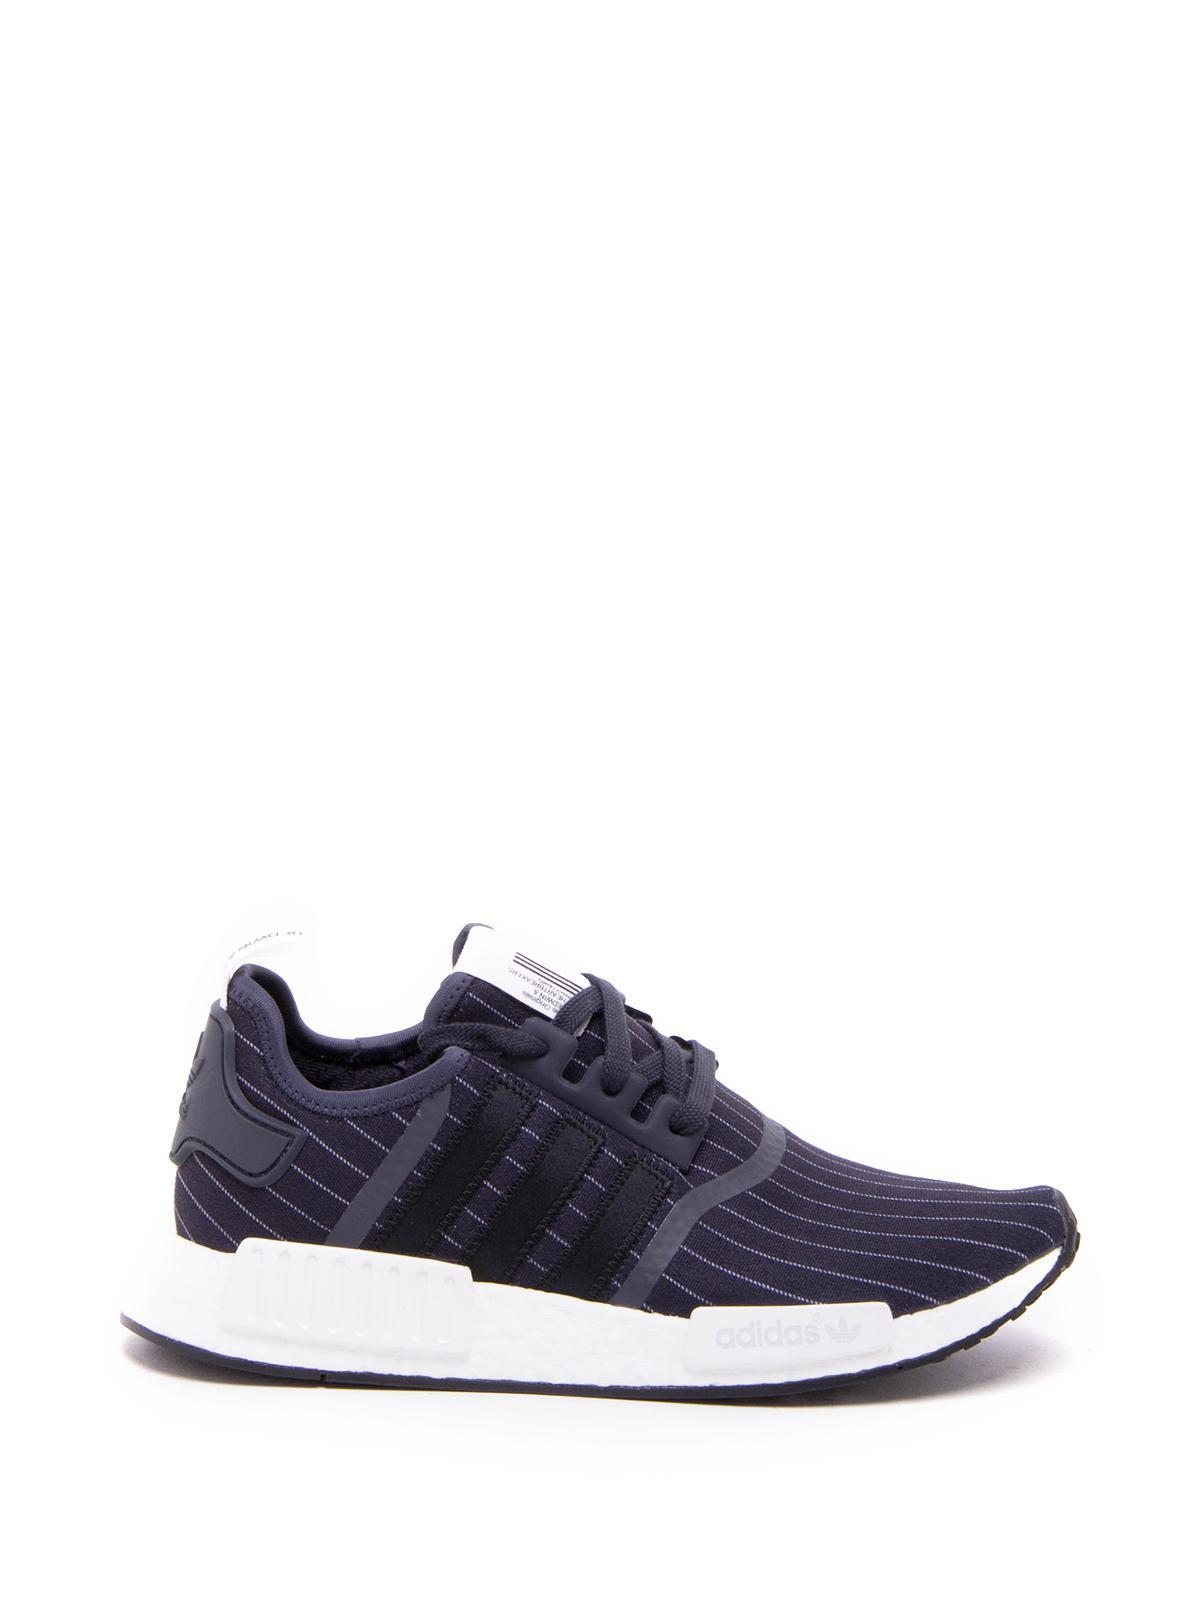 official photos 78b22 0a408 adidas Originals ADIDAS ORIGINALS Sneaker nmd r1 bedwin grigia in ...